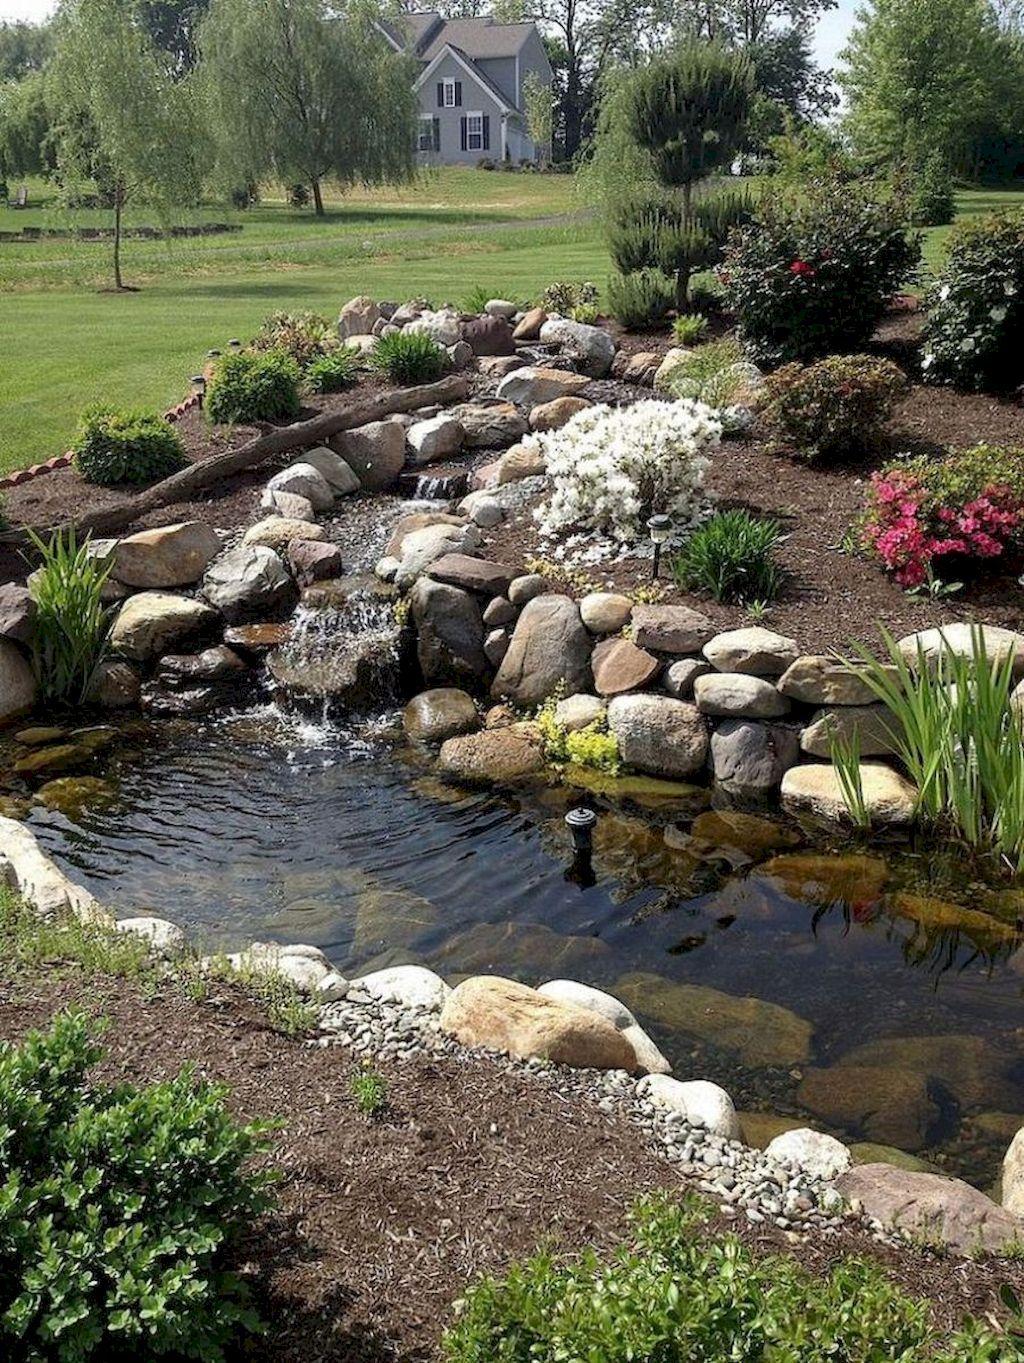 75 Incredible Backyard Ponds and Water Garden